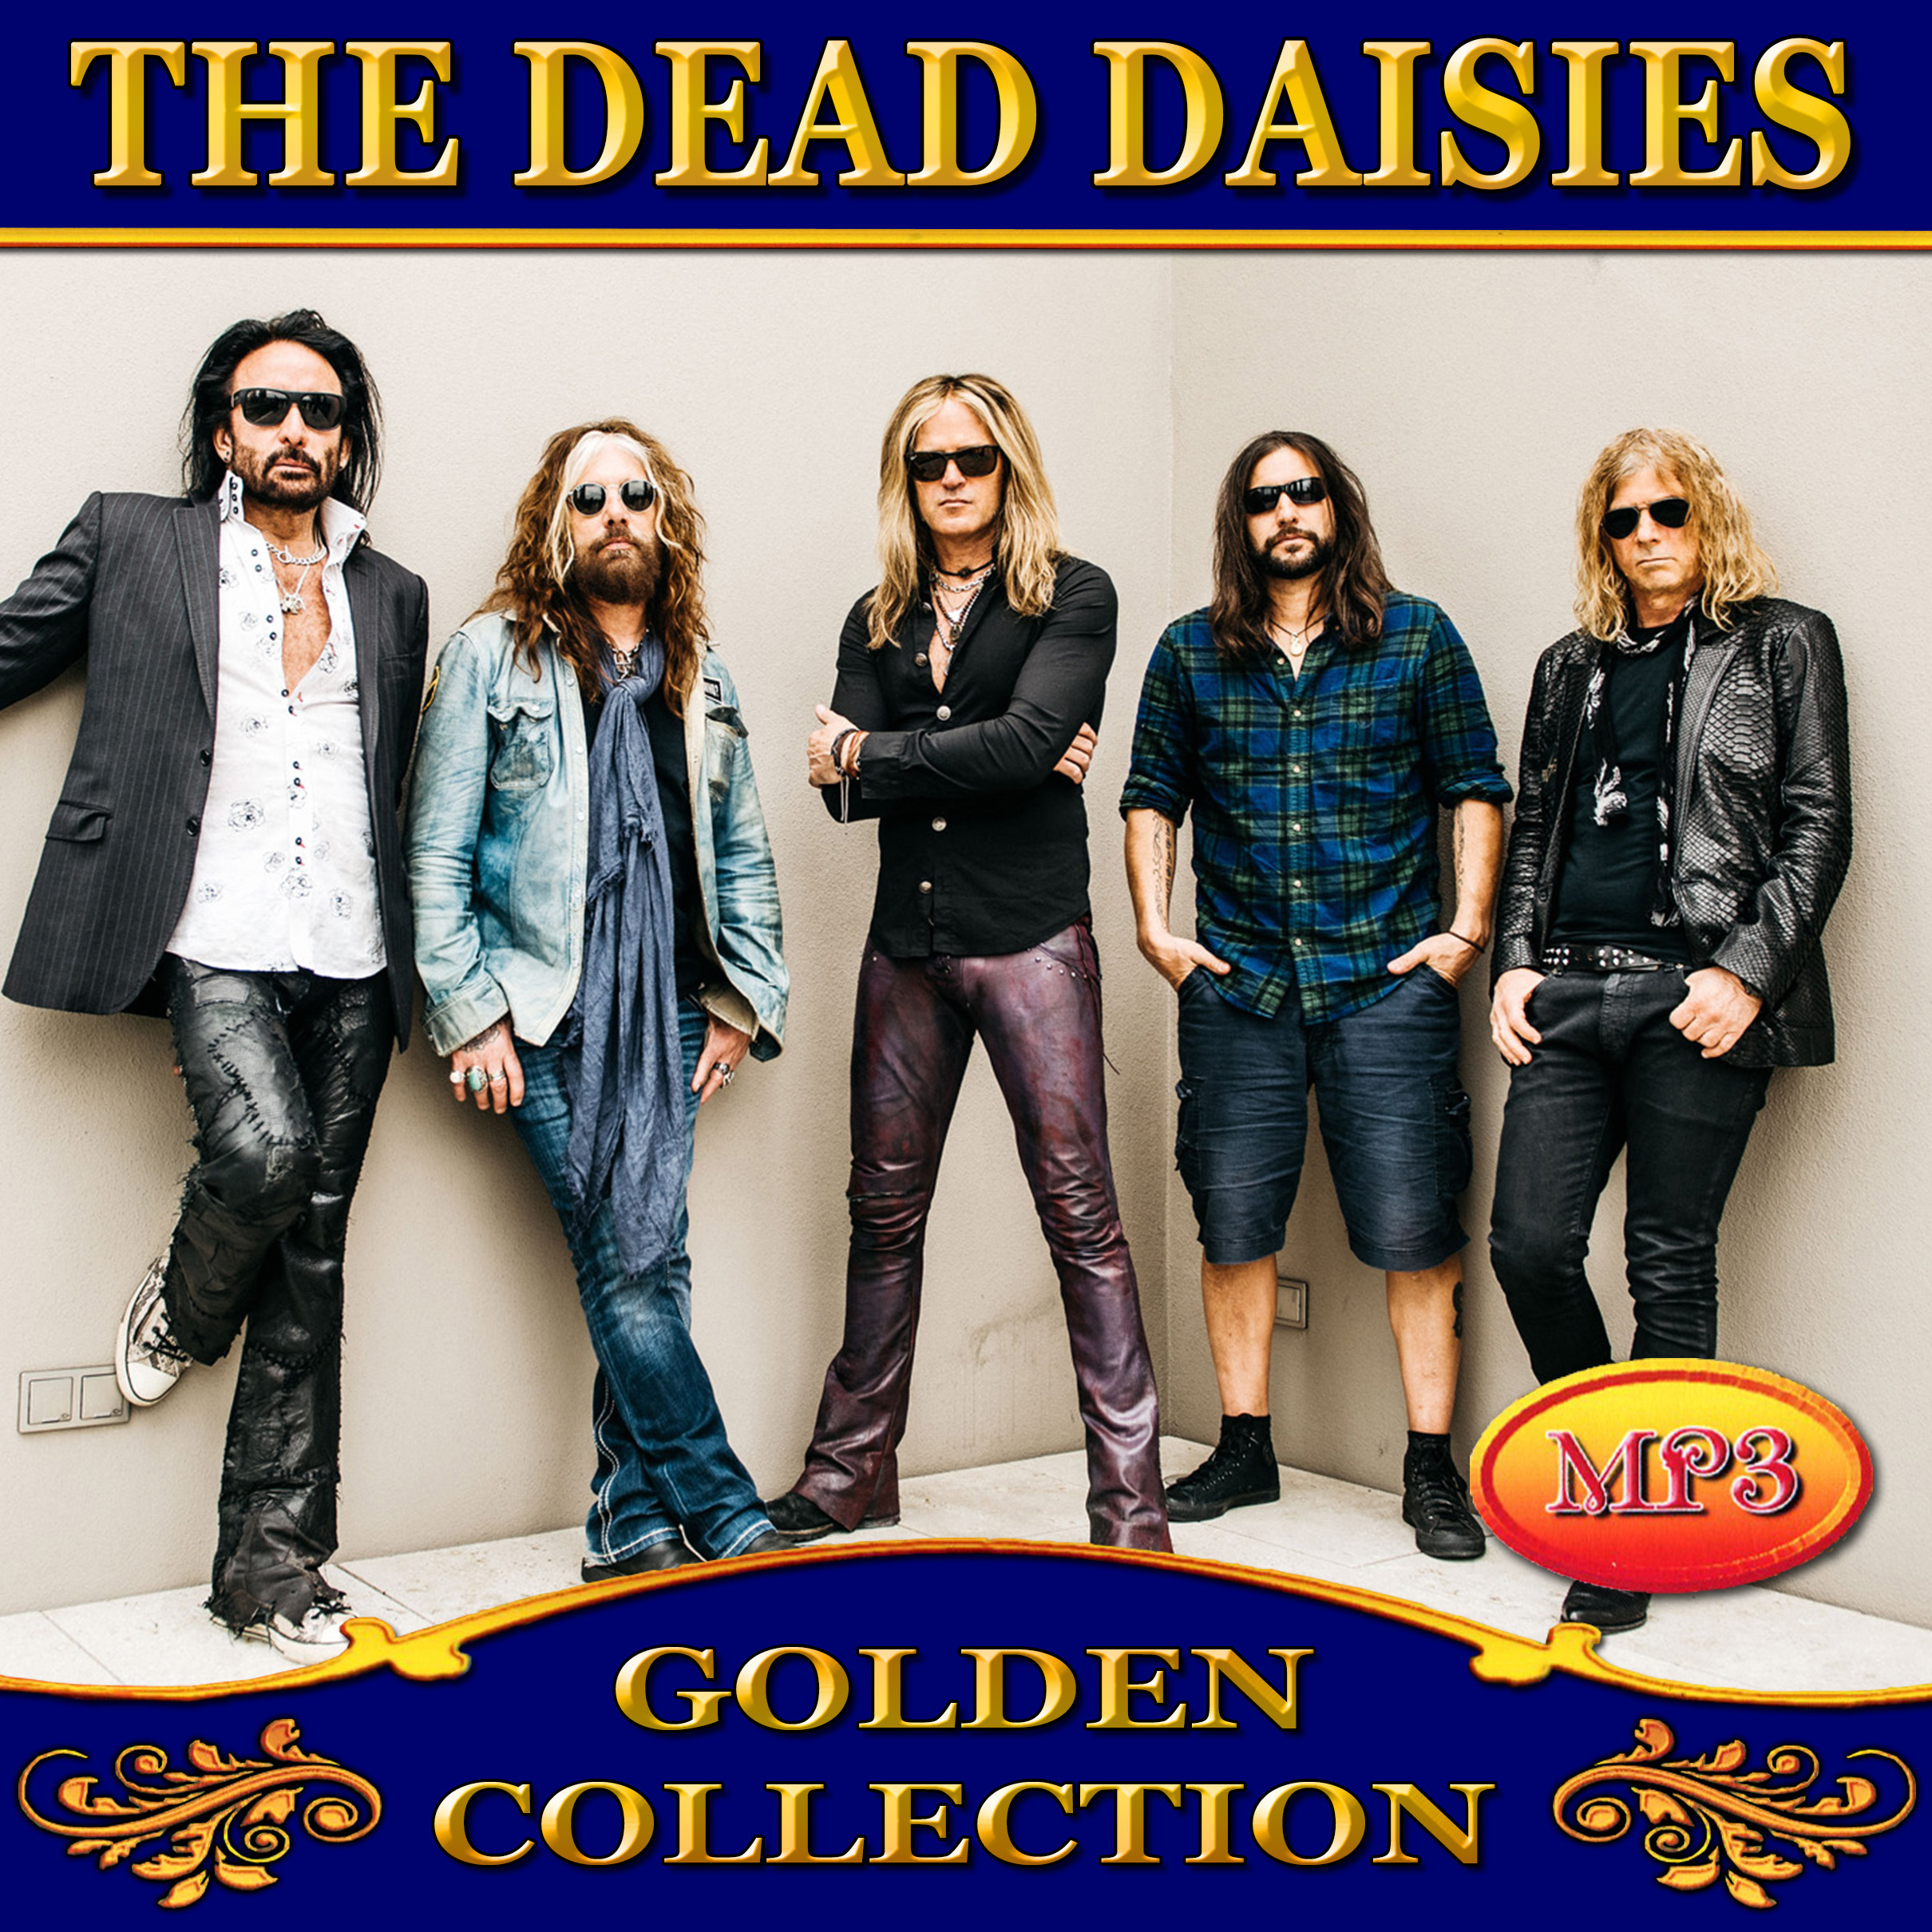 The Dead Daisies [mp3]